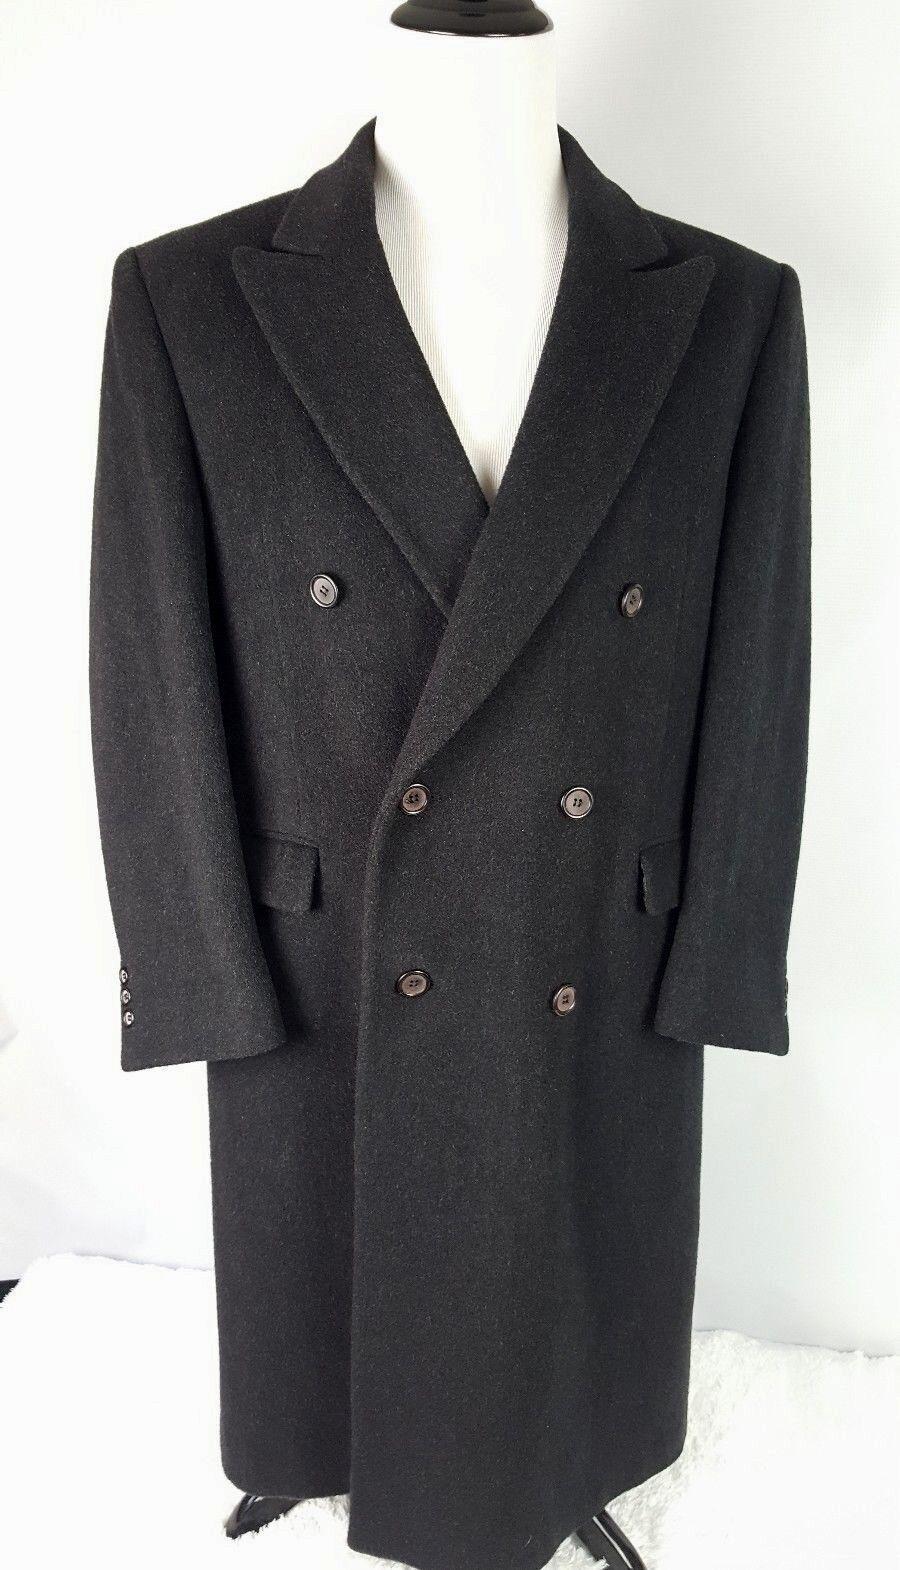 Nino Cerruti Wool Cashmere Blend Long Coat Charcoal grau Men Größe 40R